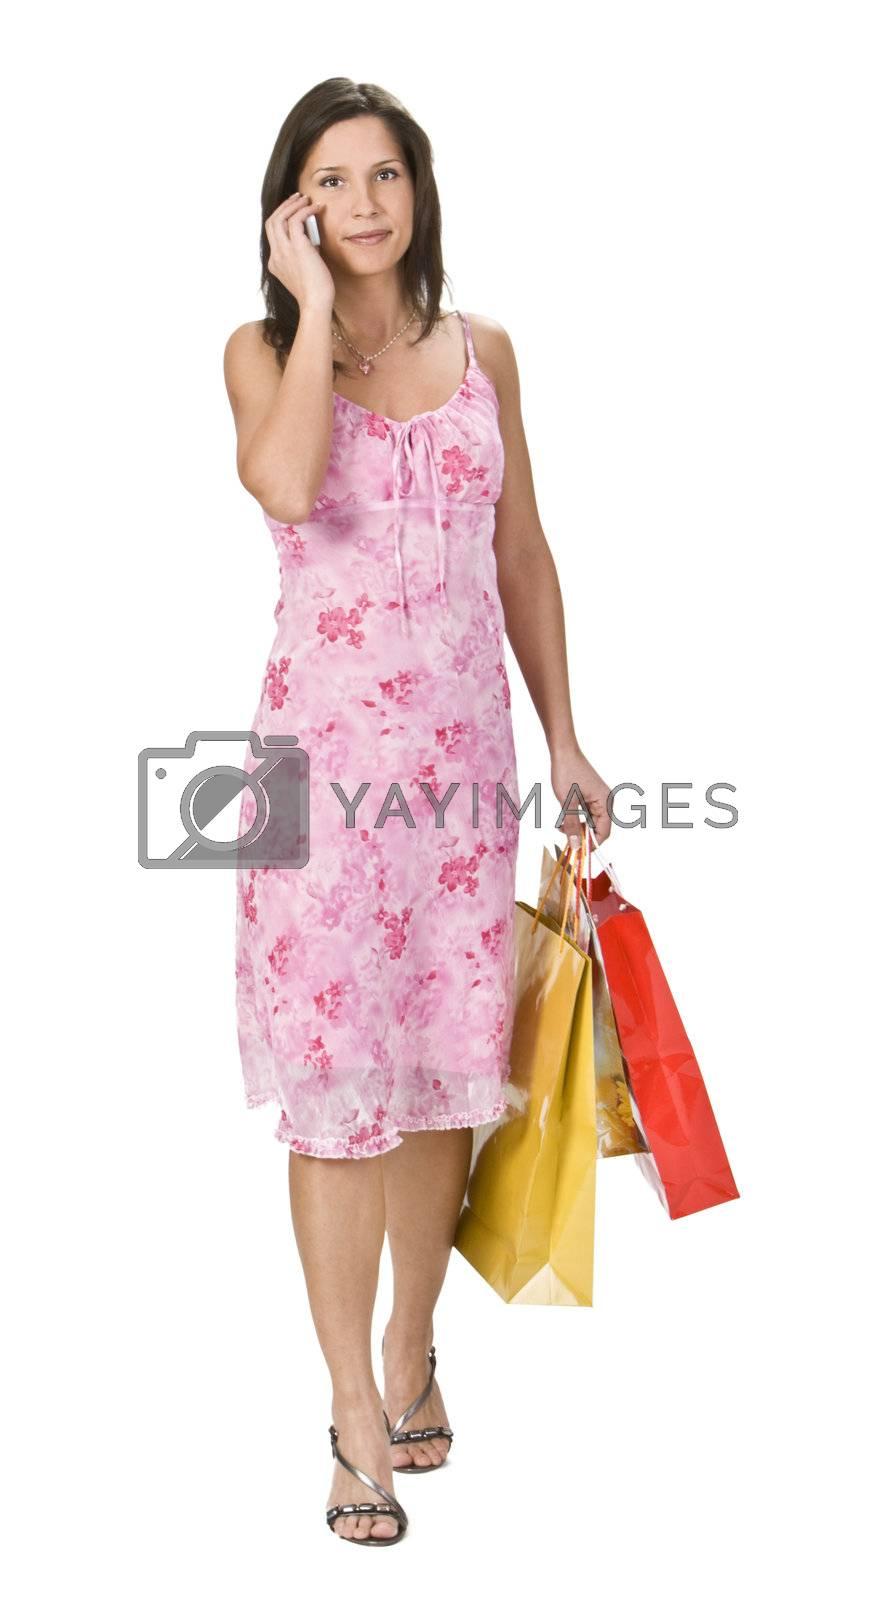 Shopping communication by RazvanPhotography